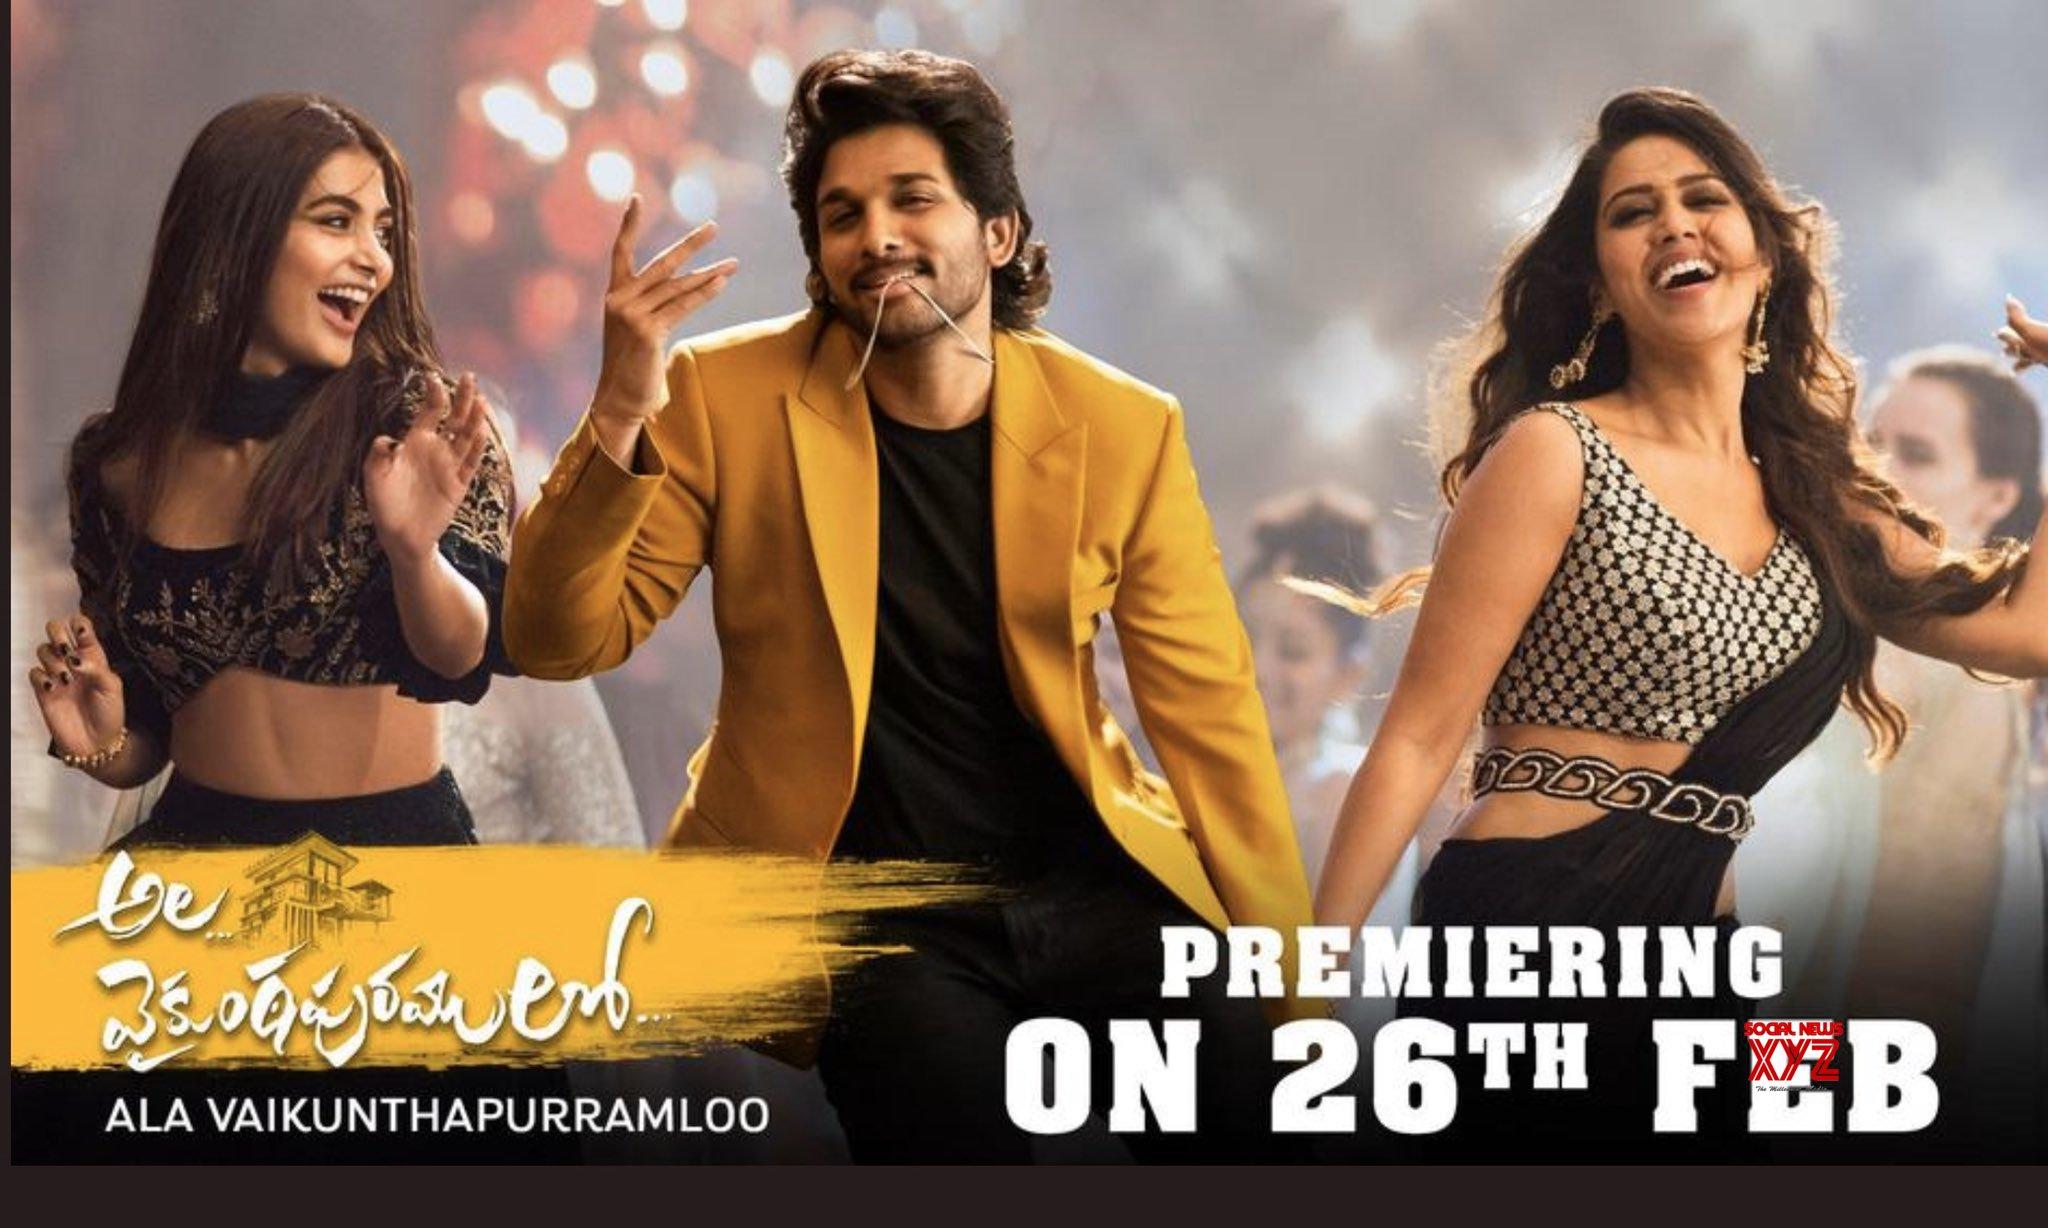 Allu Arjun S Ala Vaikunthapurramloo Movie Will Be Streaming On Sun Nxt Netflix From 27th Feb 2020 Social News Xyz